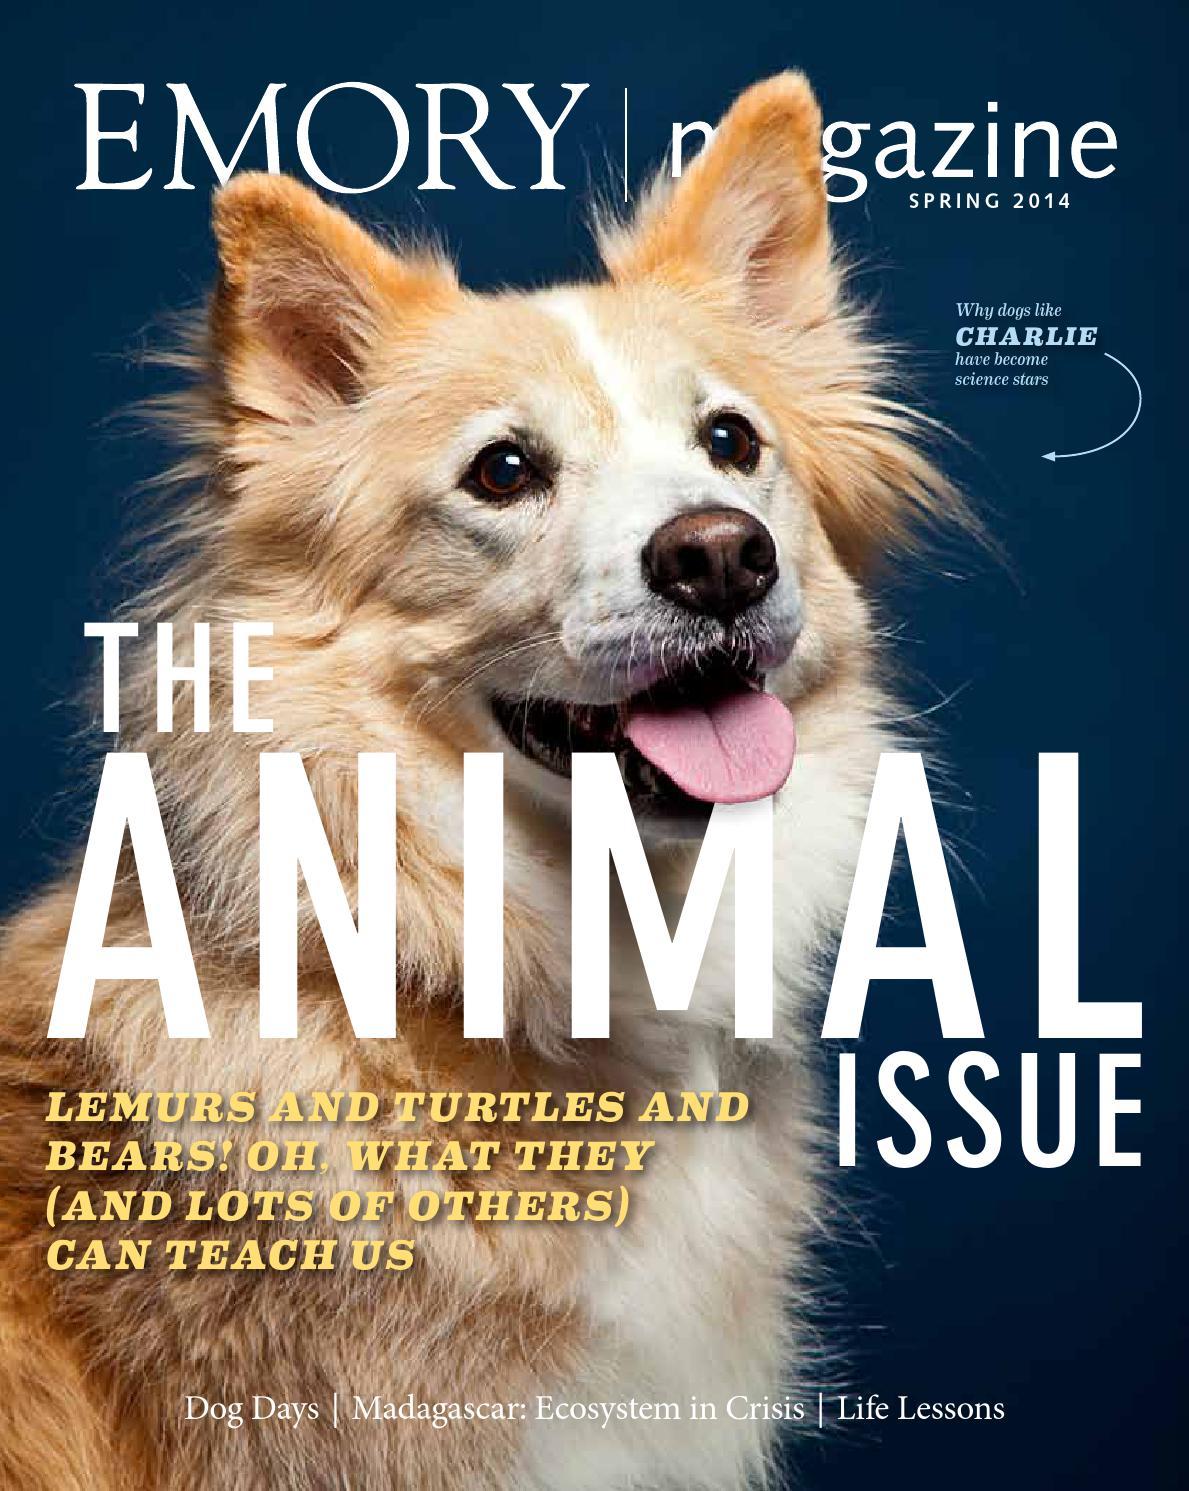 Emory Magazine / Spring 2014 by Emory University - issuu